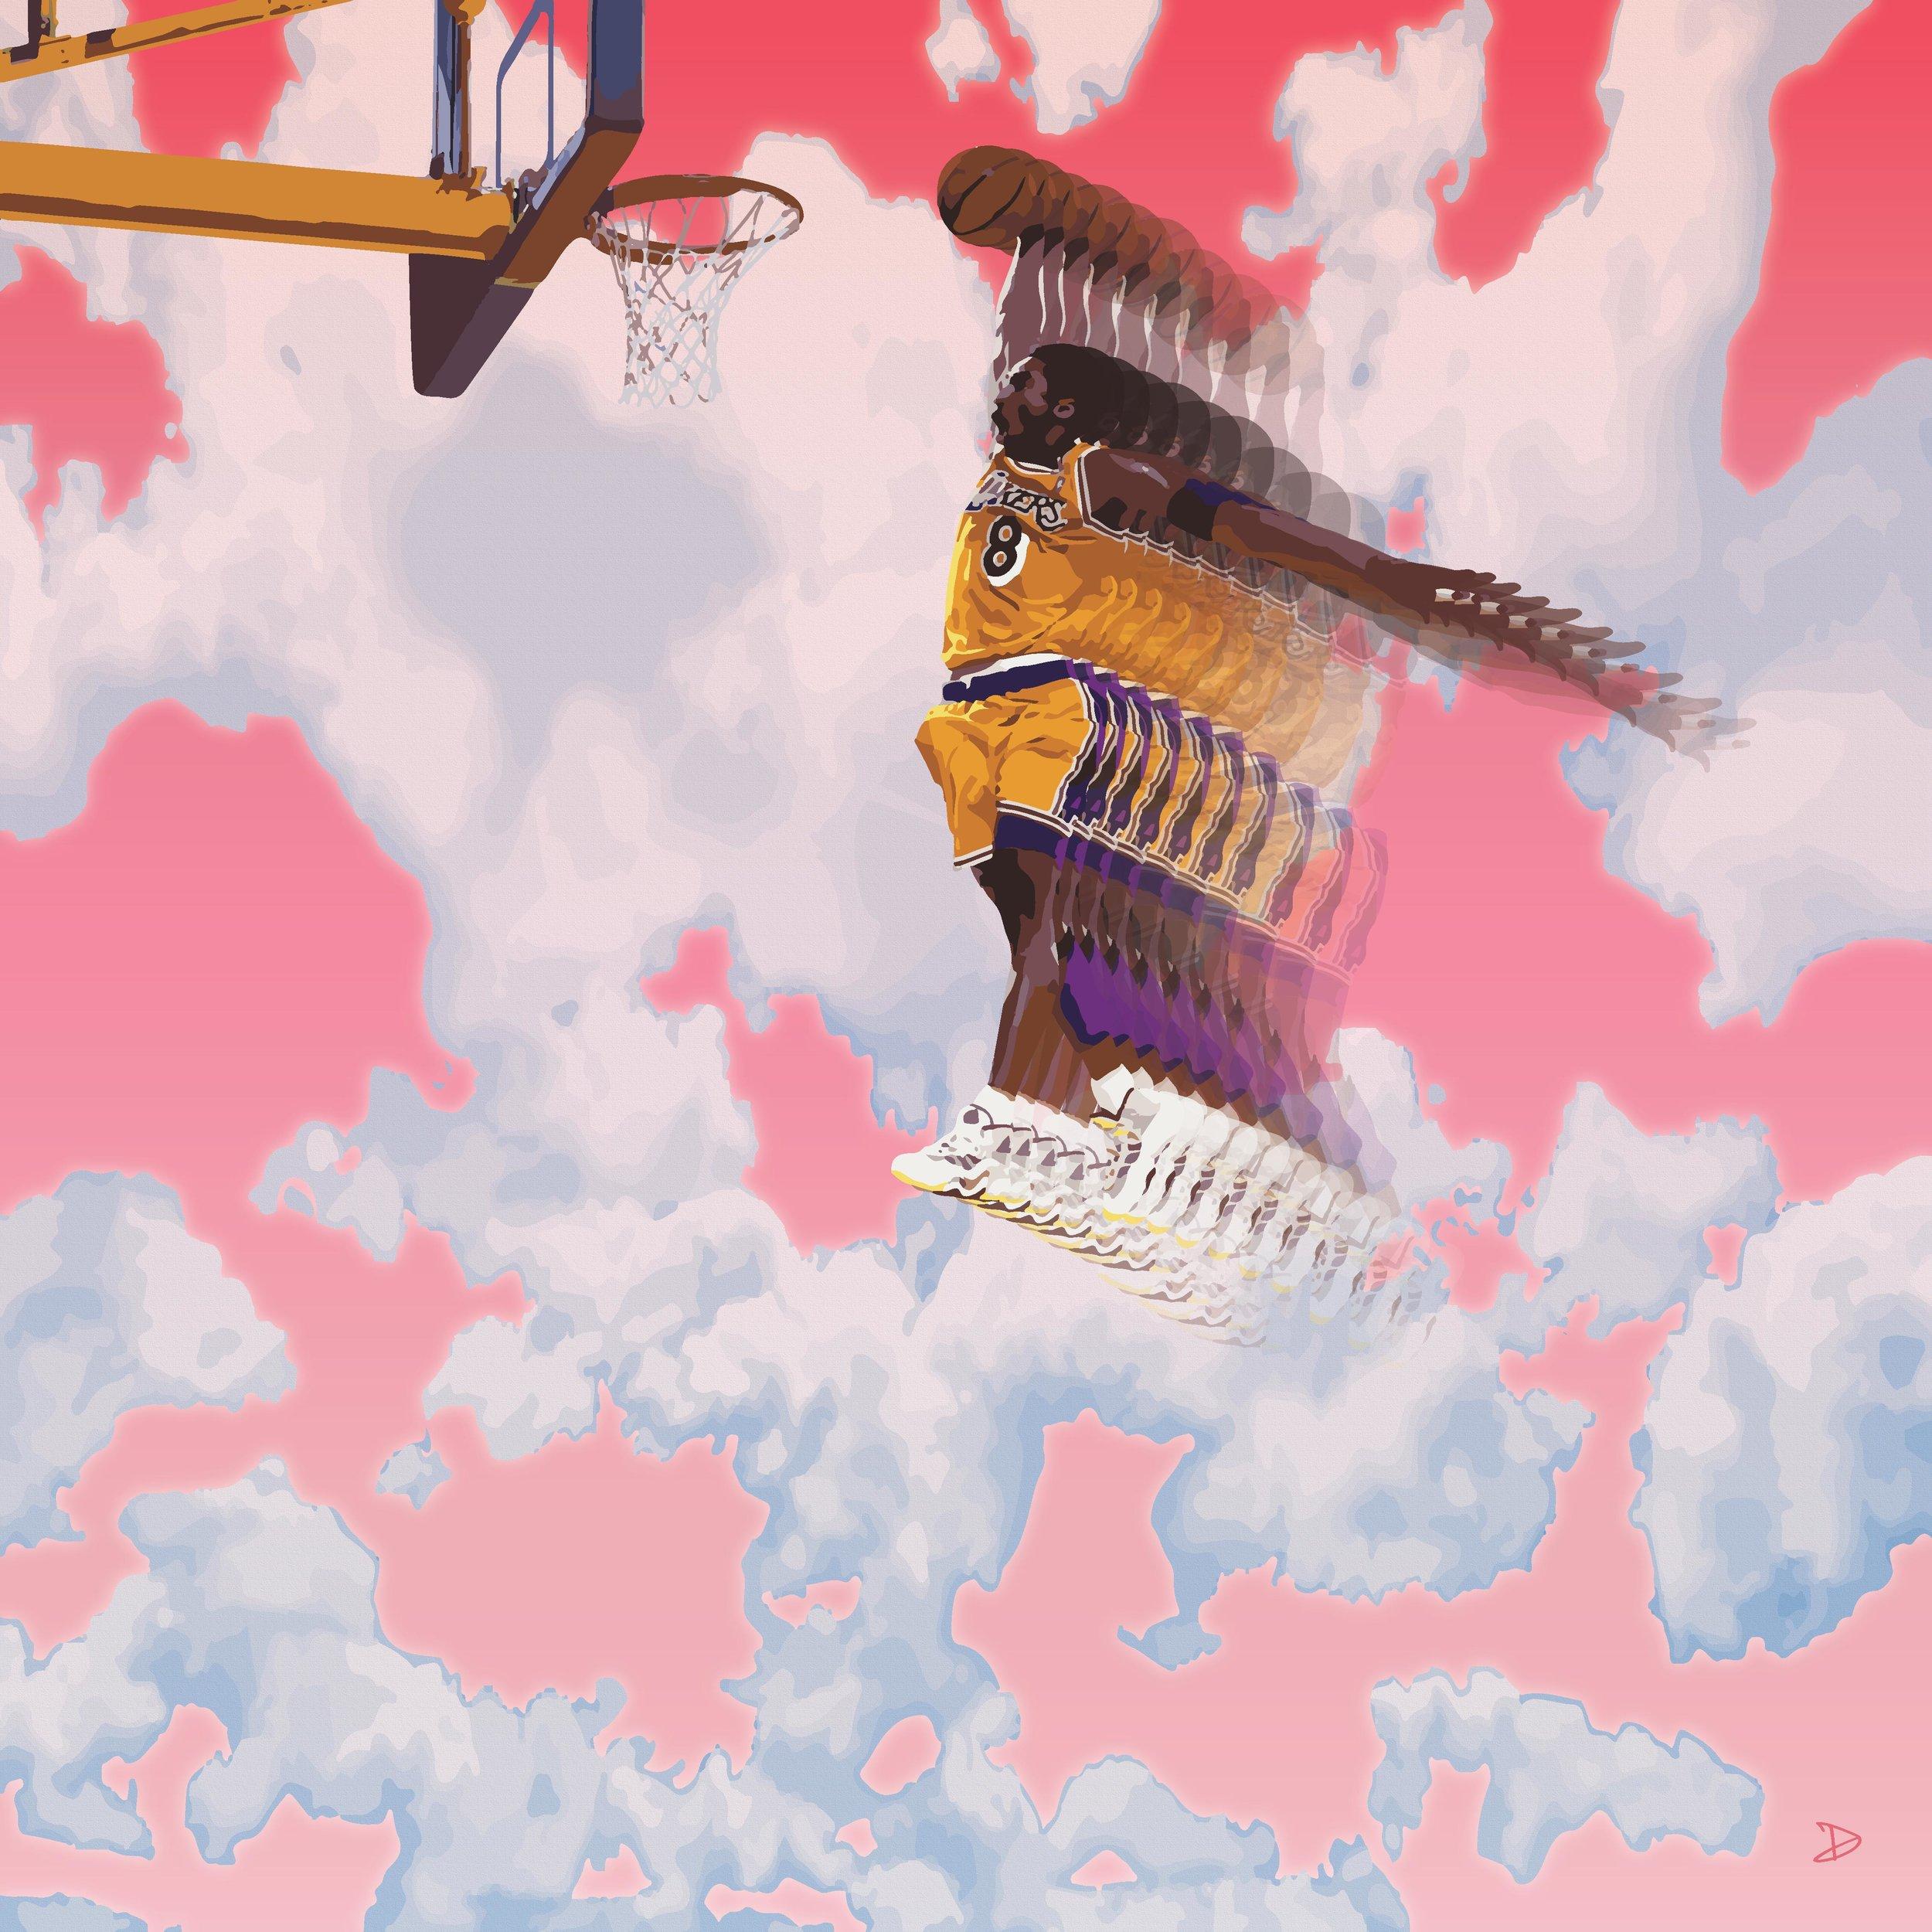 kobe dunk-page-001.jpg